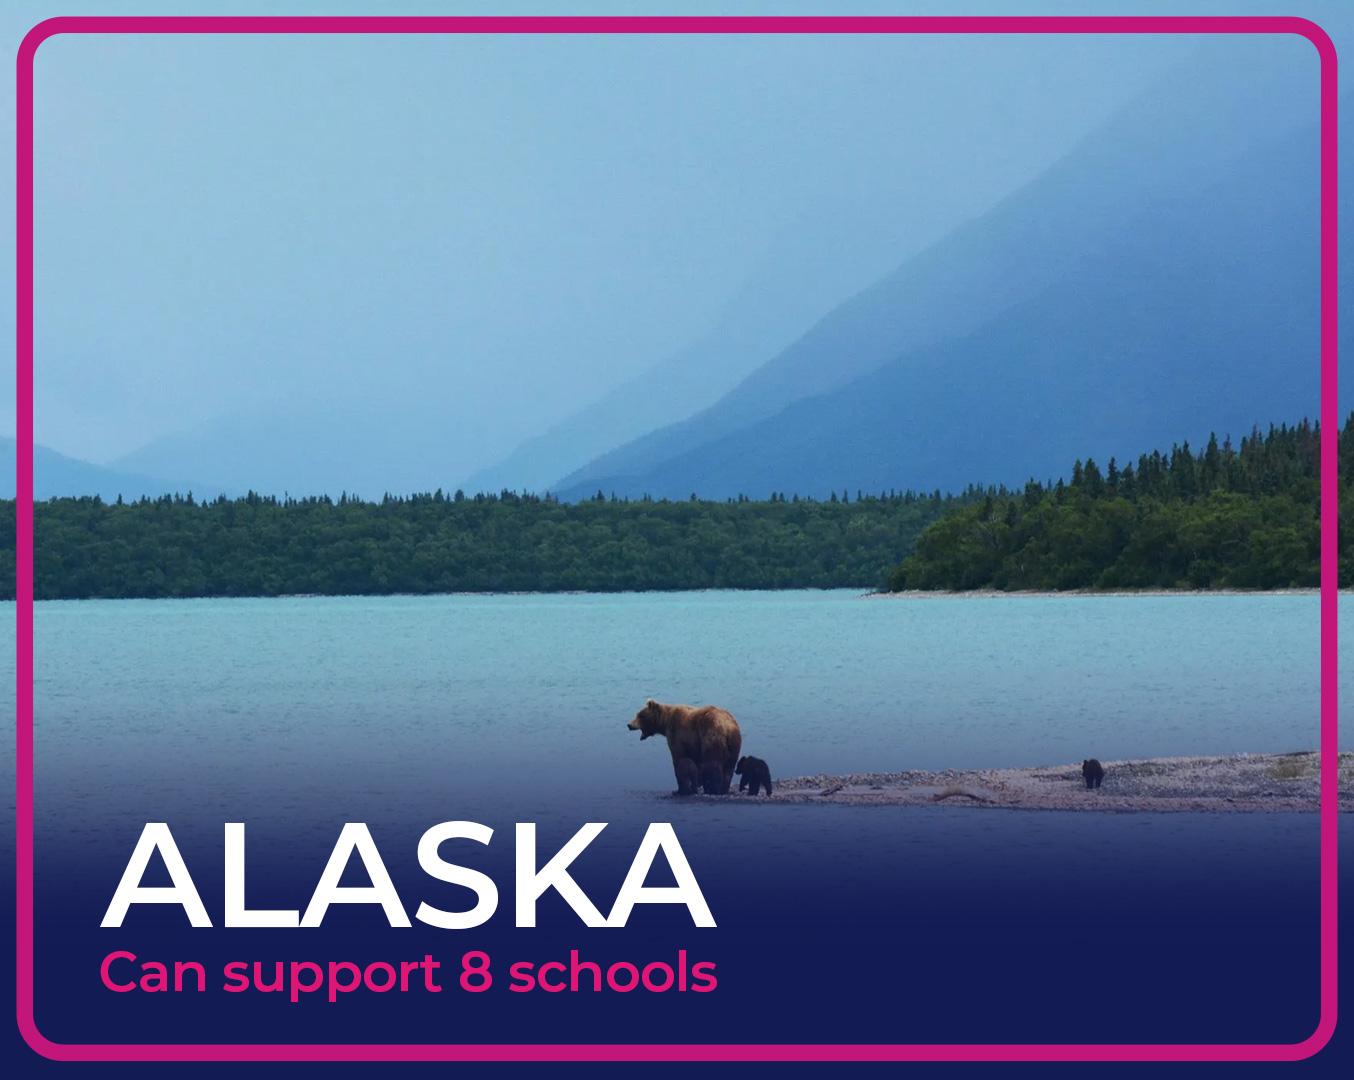 https://mcpdental.com/wp-content/uploads/2020/11/ALASKA.jpg